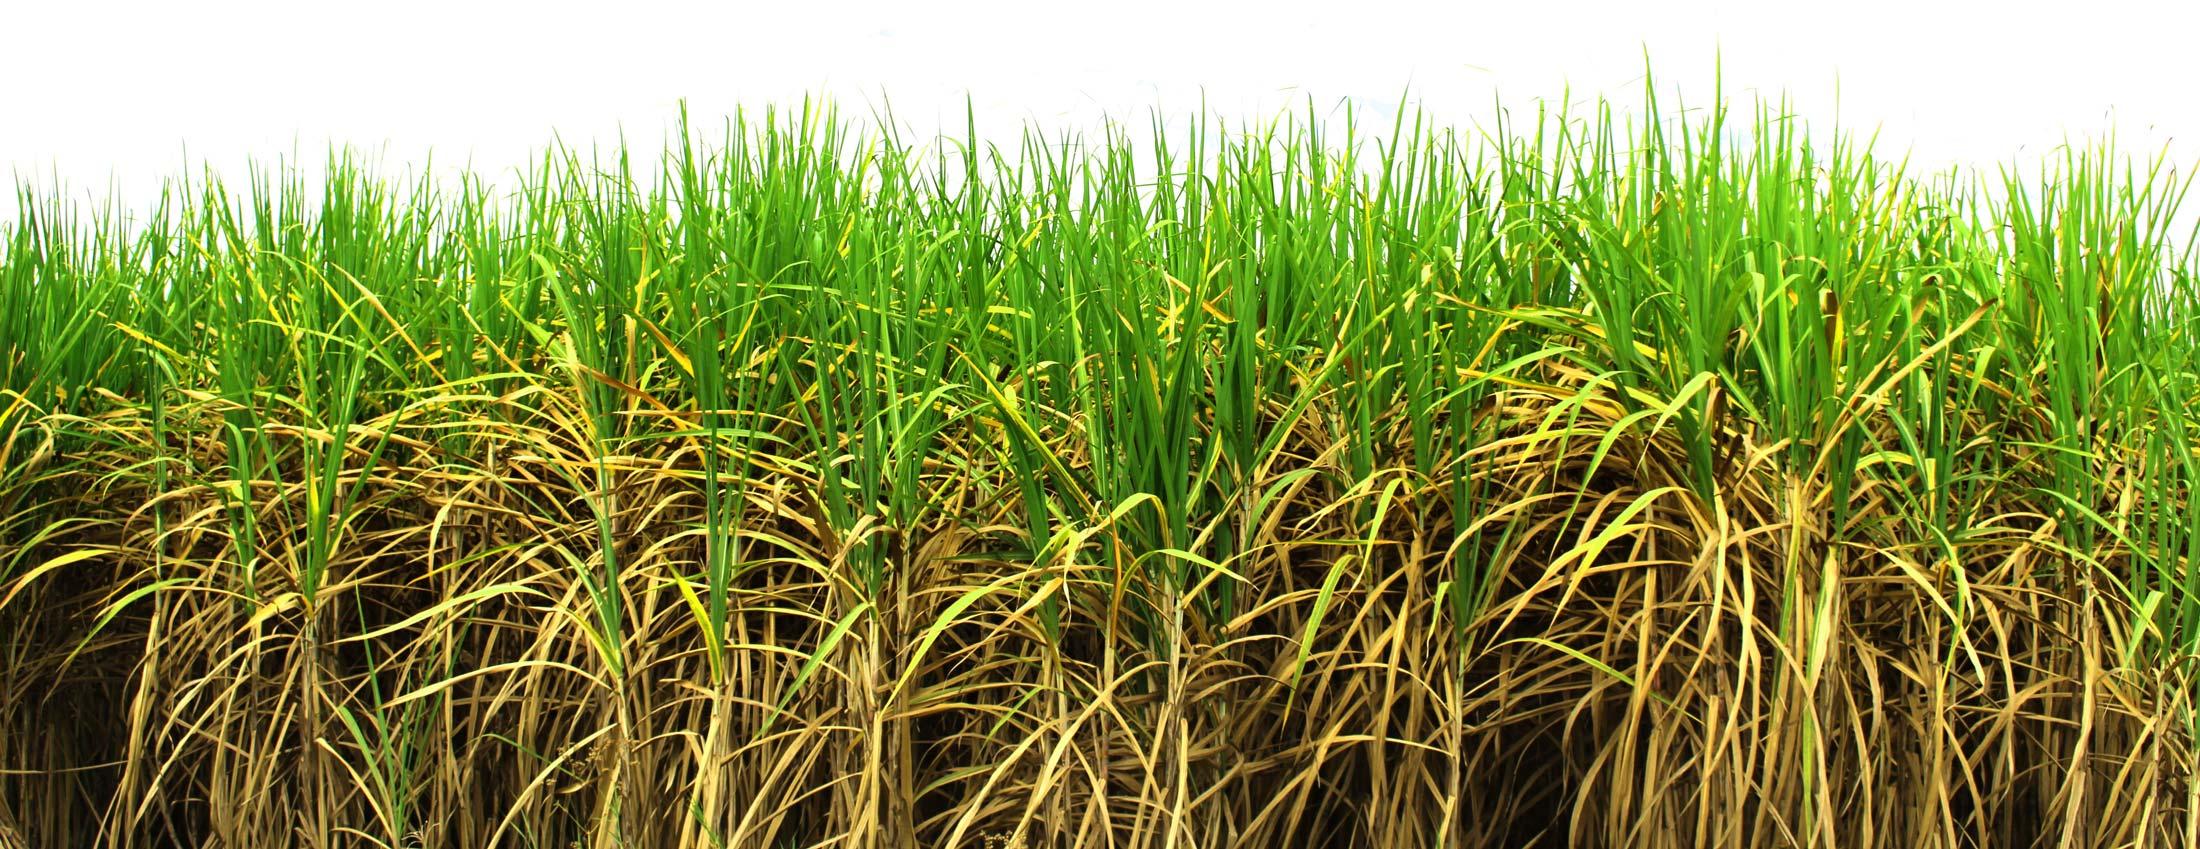 sugarcane stalk